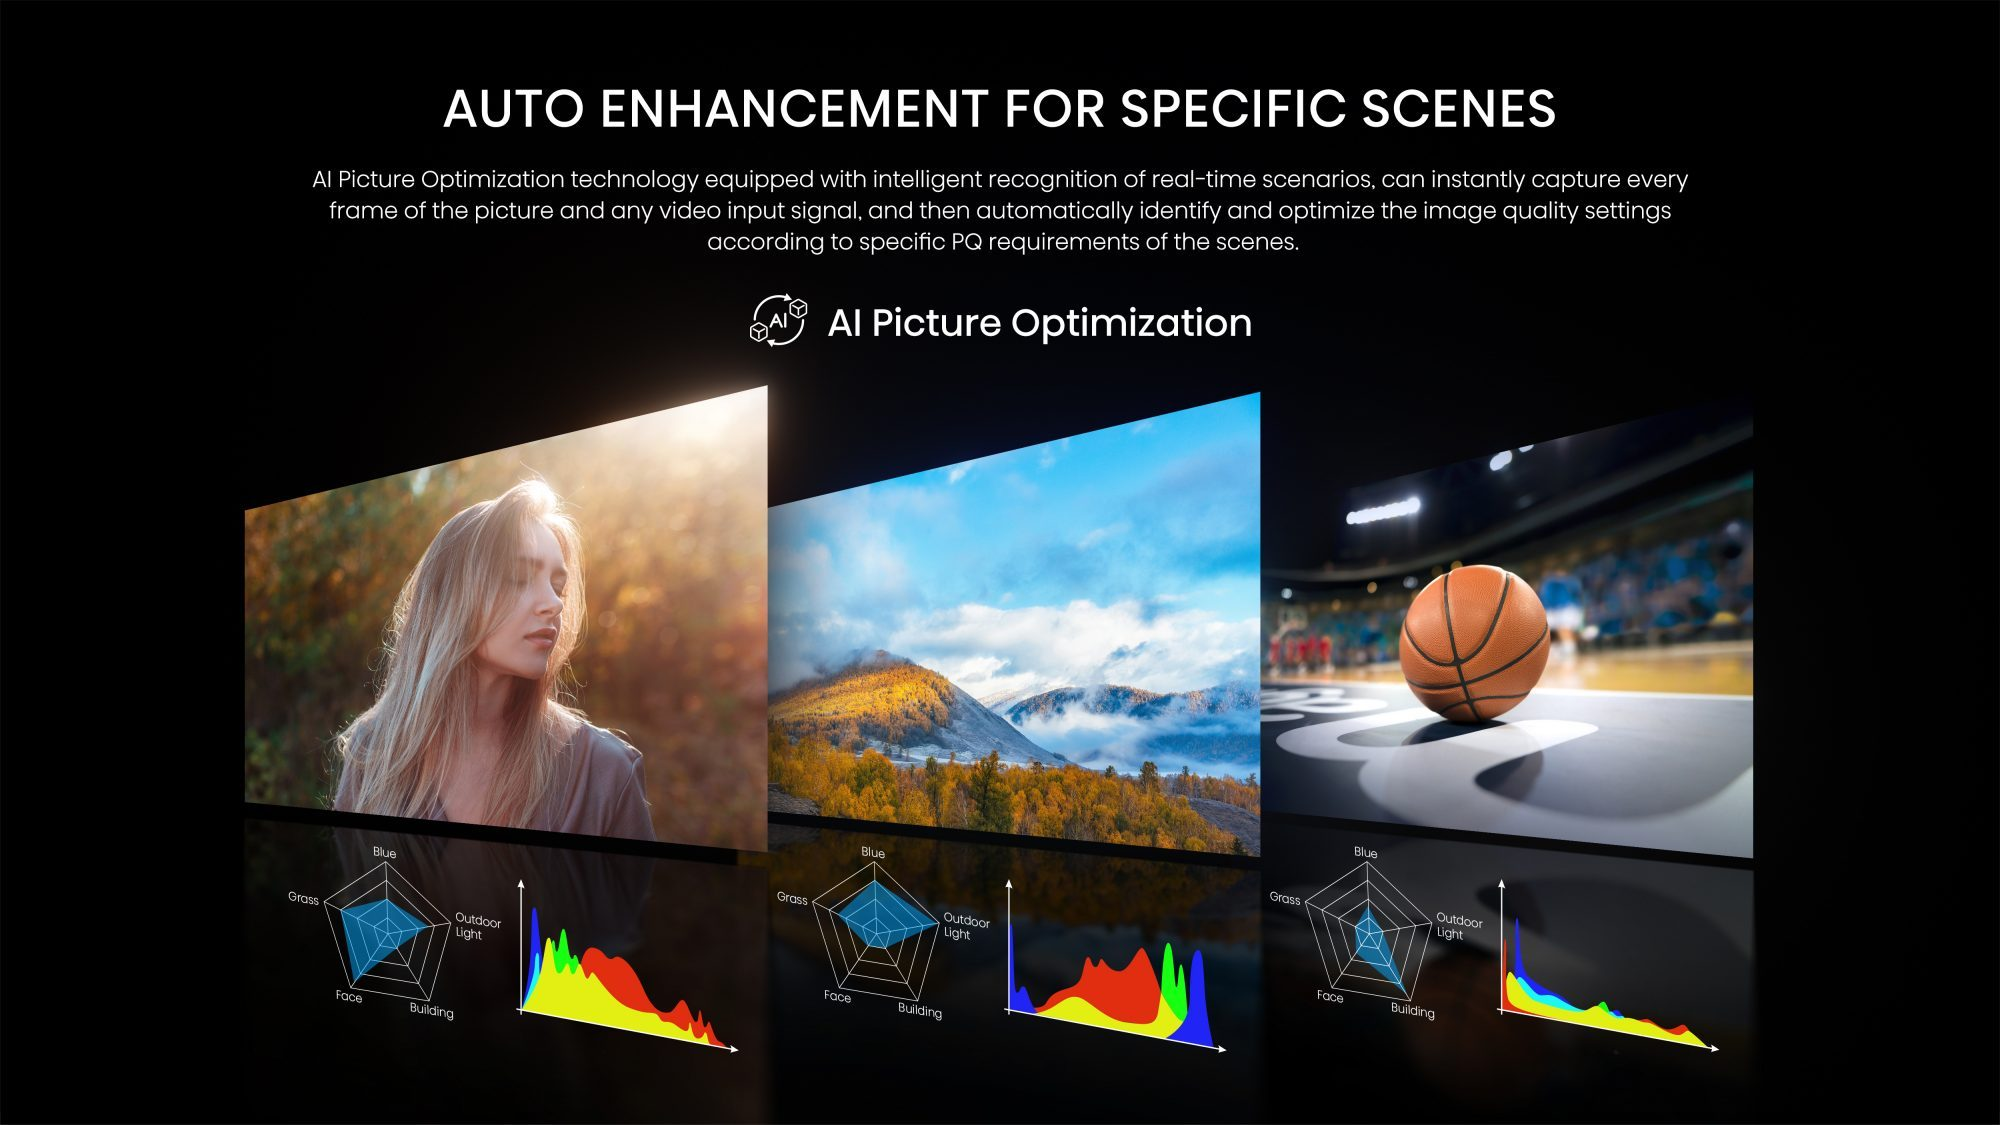 AI Picture Optimization